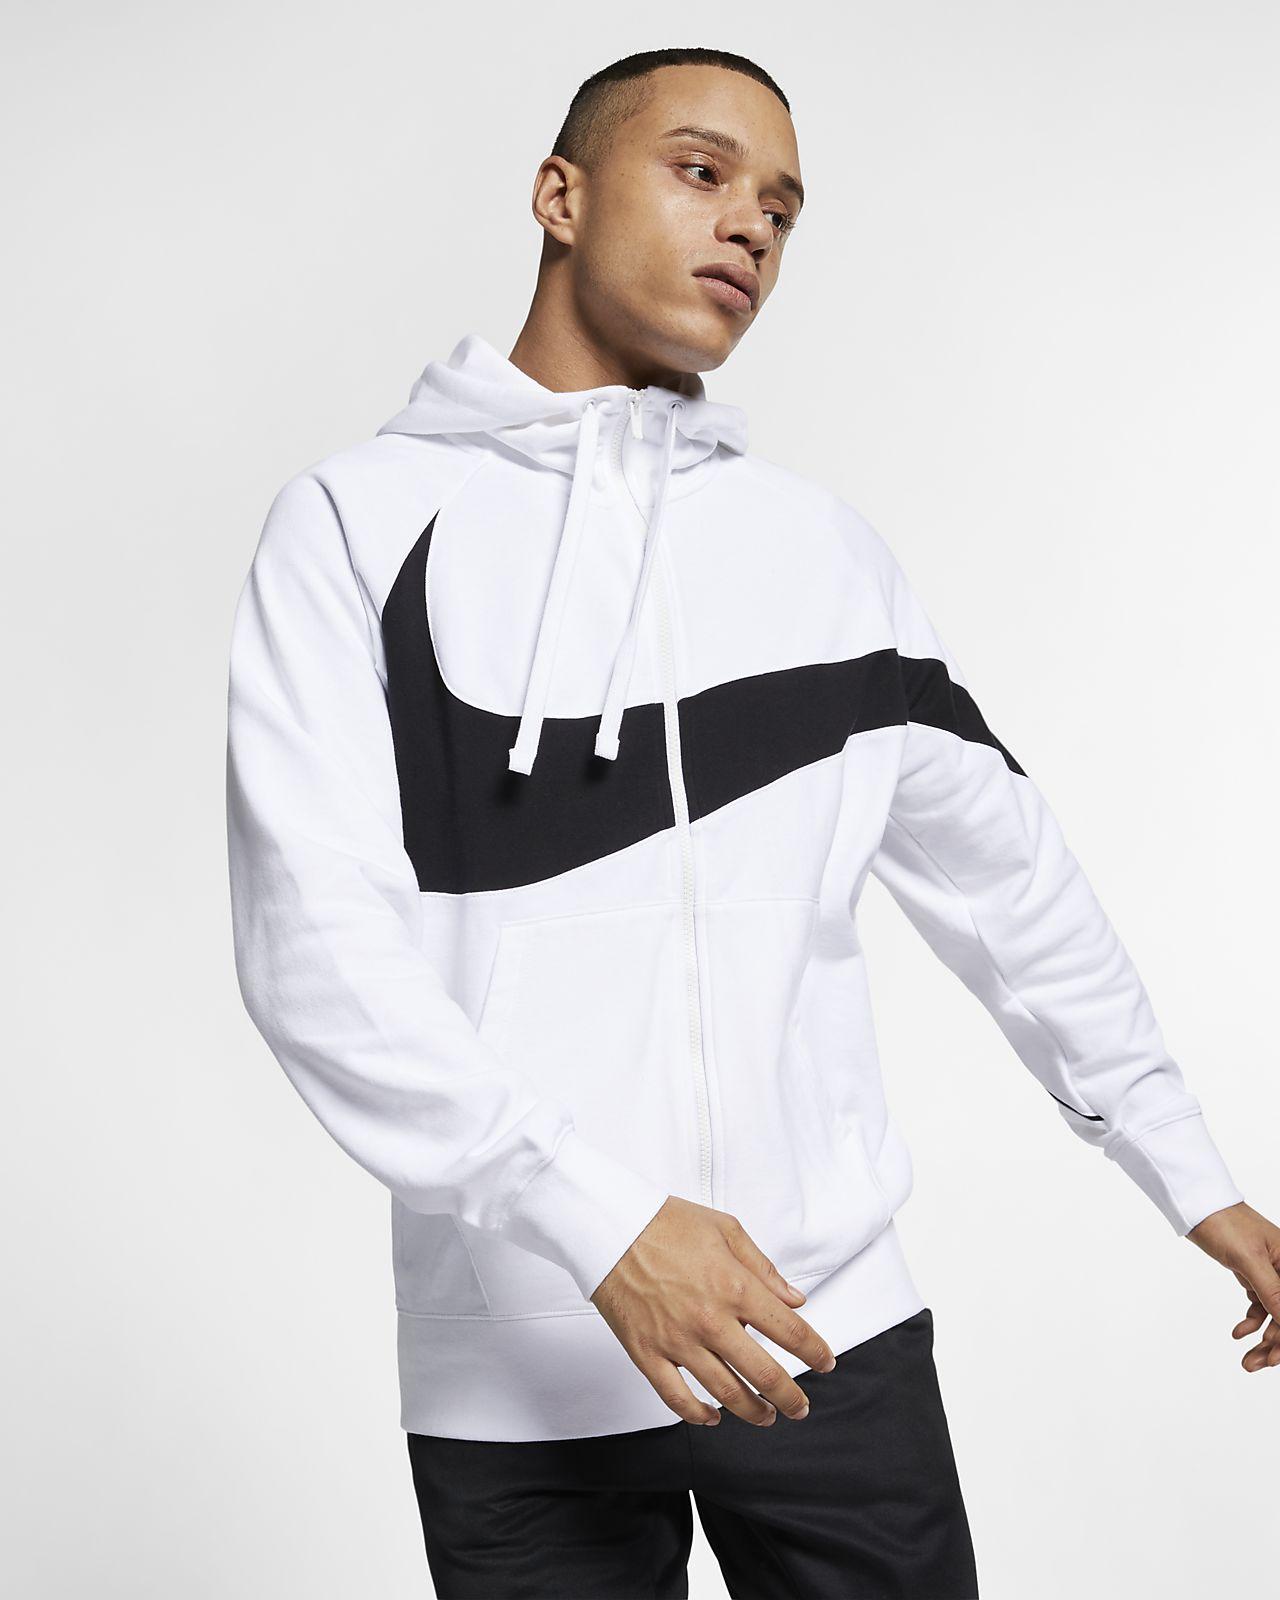 f4b49abe308d ... Ανδρική μπλούζα με κουκούλα και φερμουάρ από υλικό French Terry Nike  Sportswear